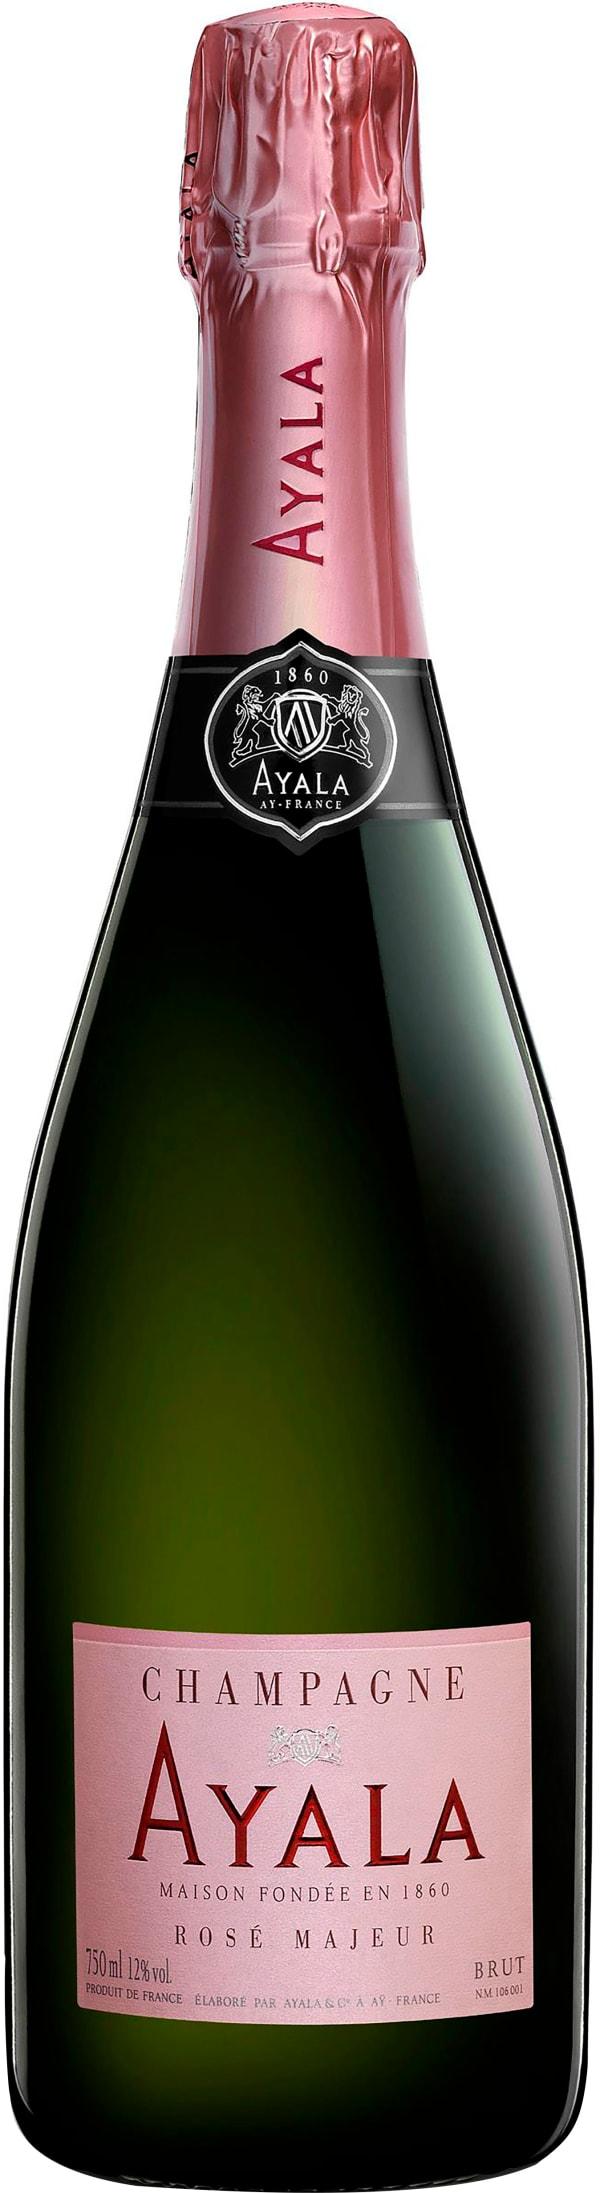 Ayala Rosé Majeur Champagne Brut